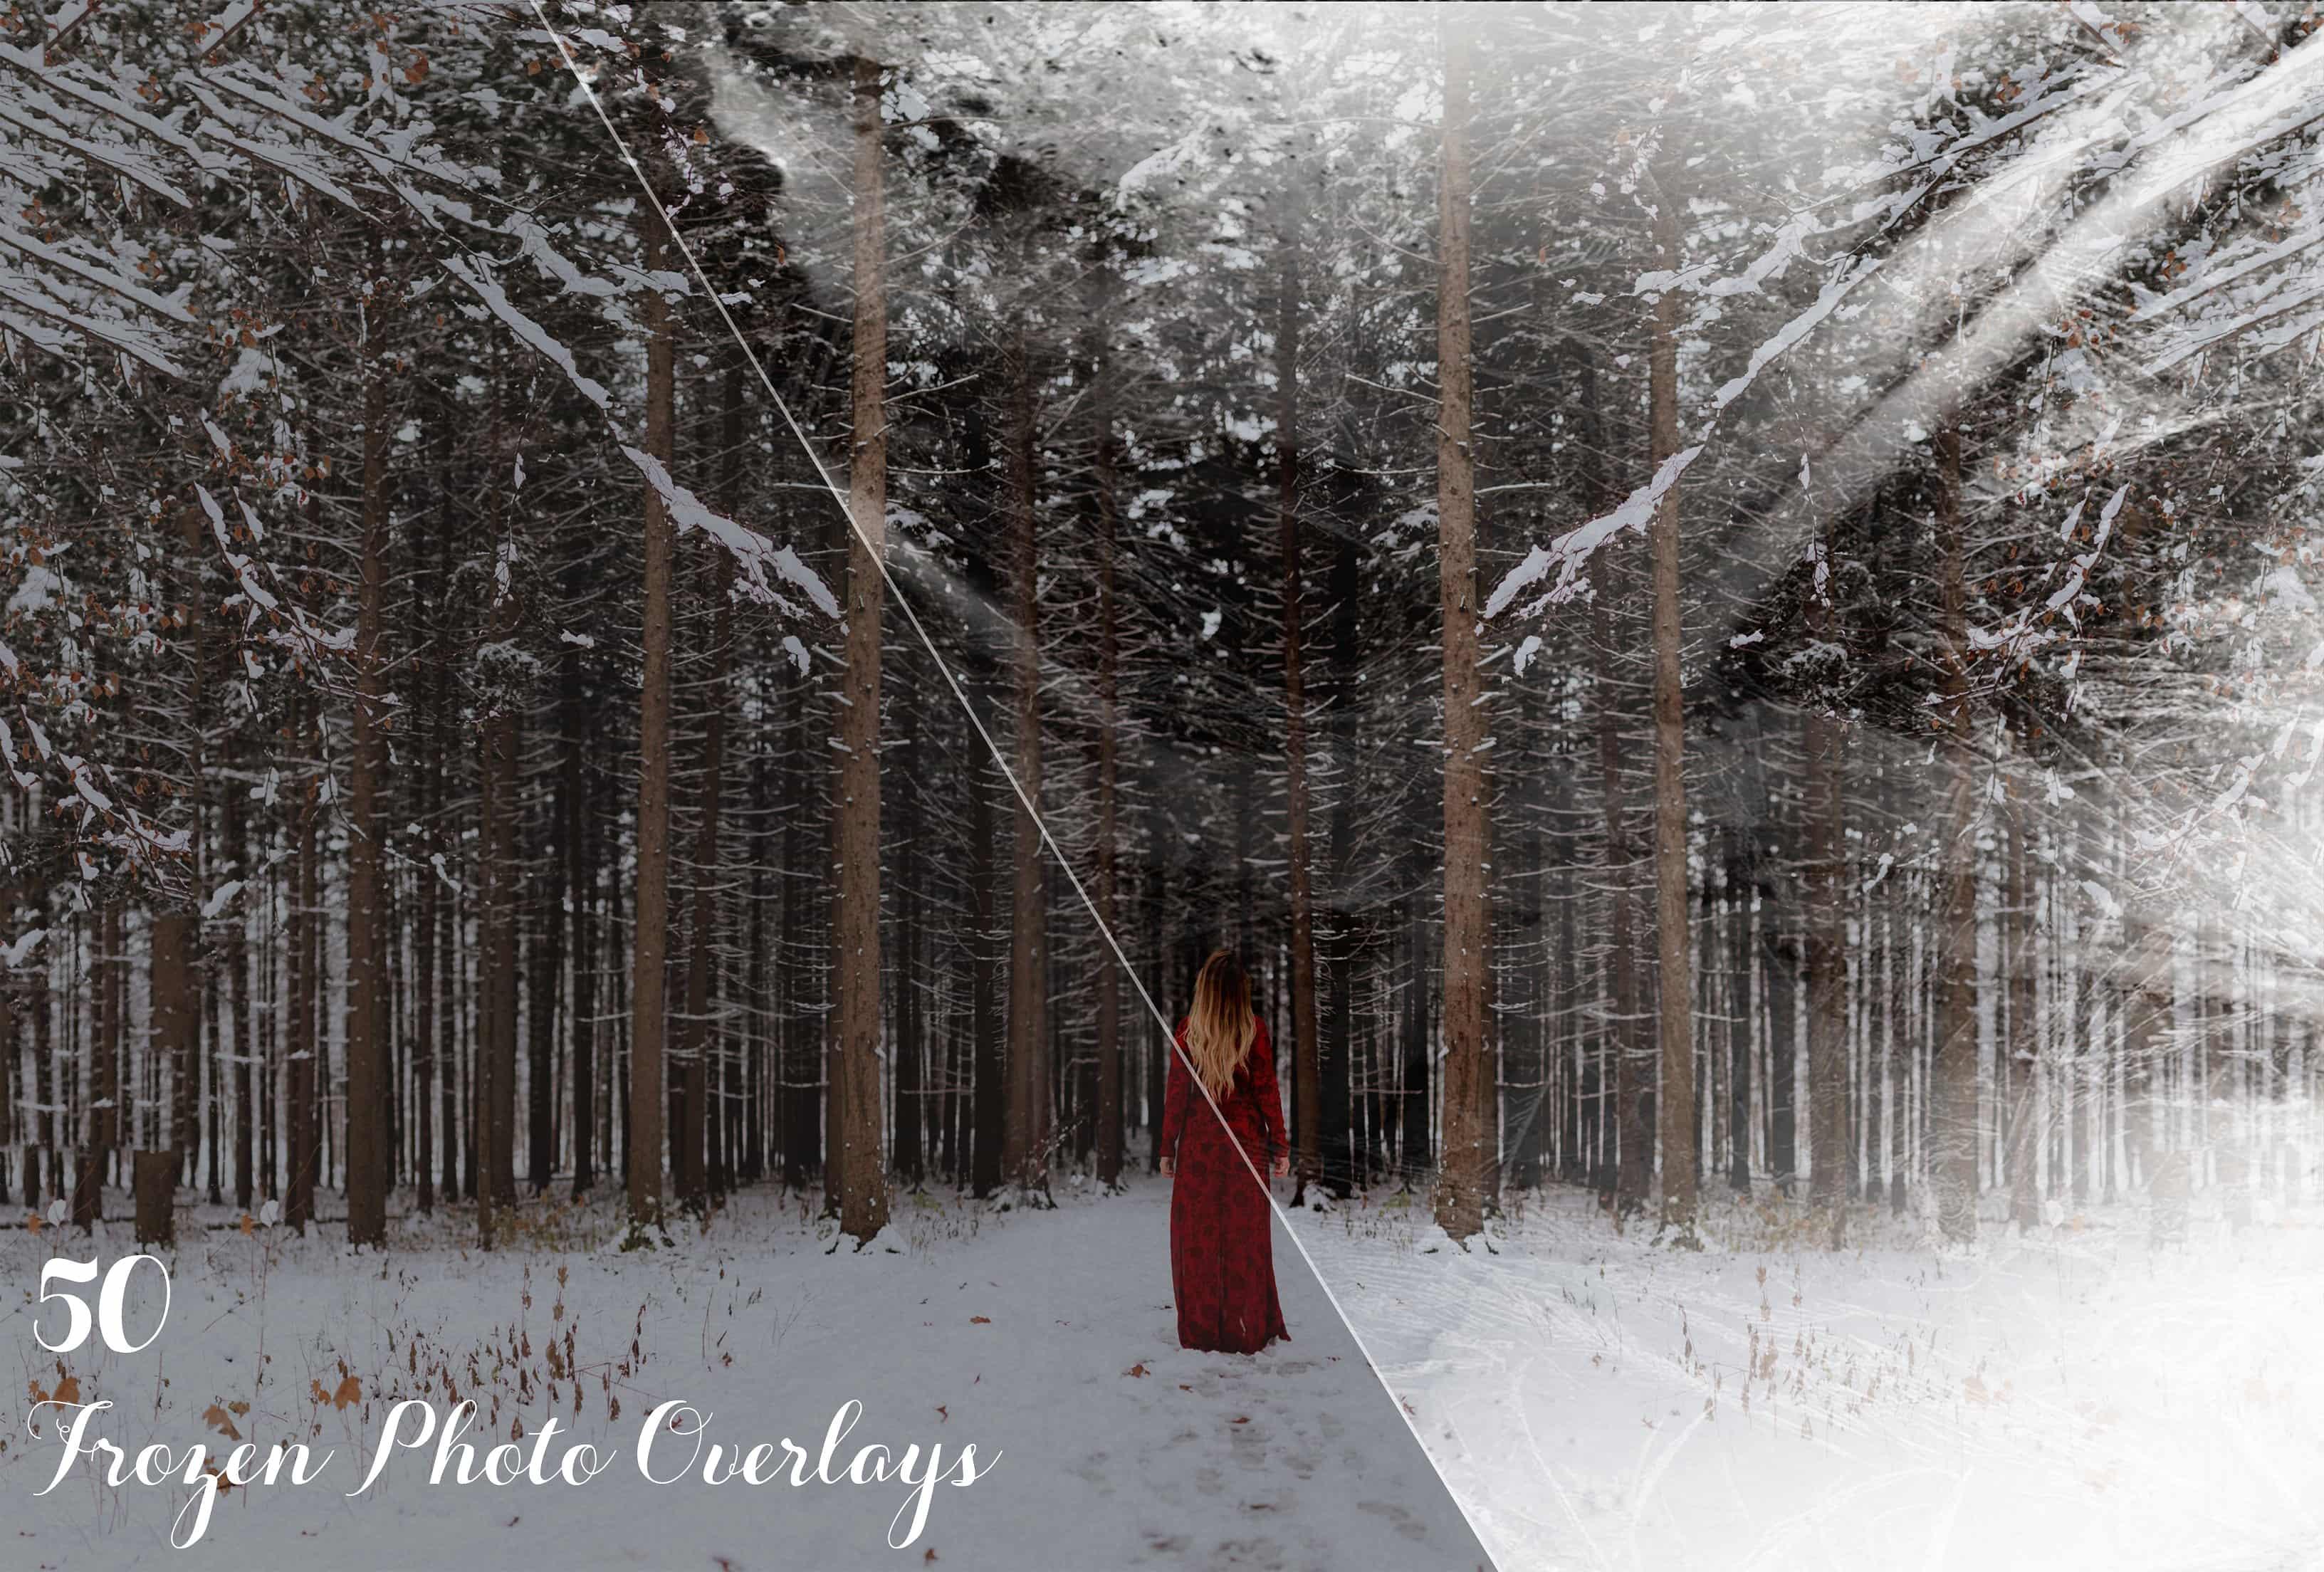 2500+ Christmas & Winter Overlays Bundle - $29 - 29 min